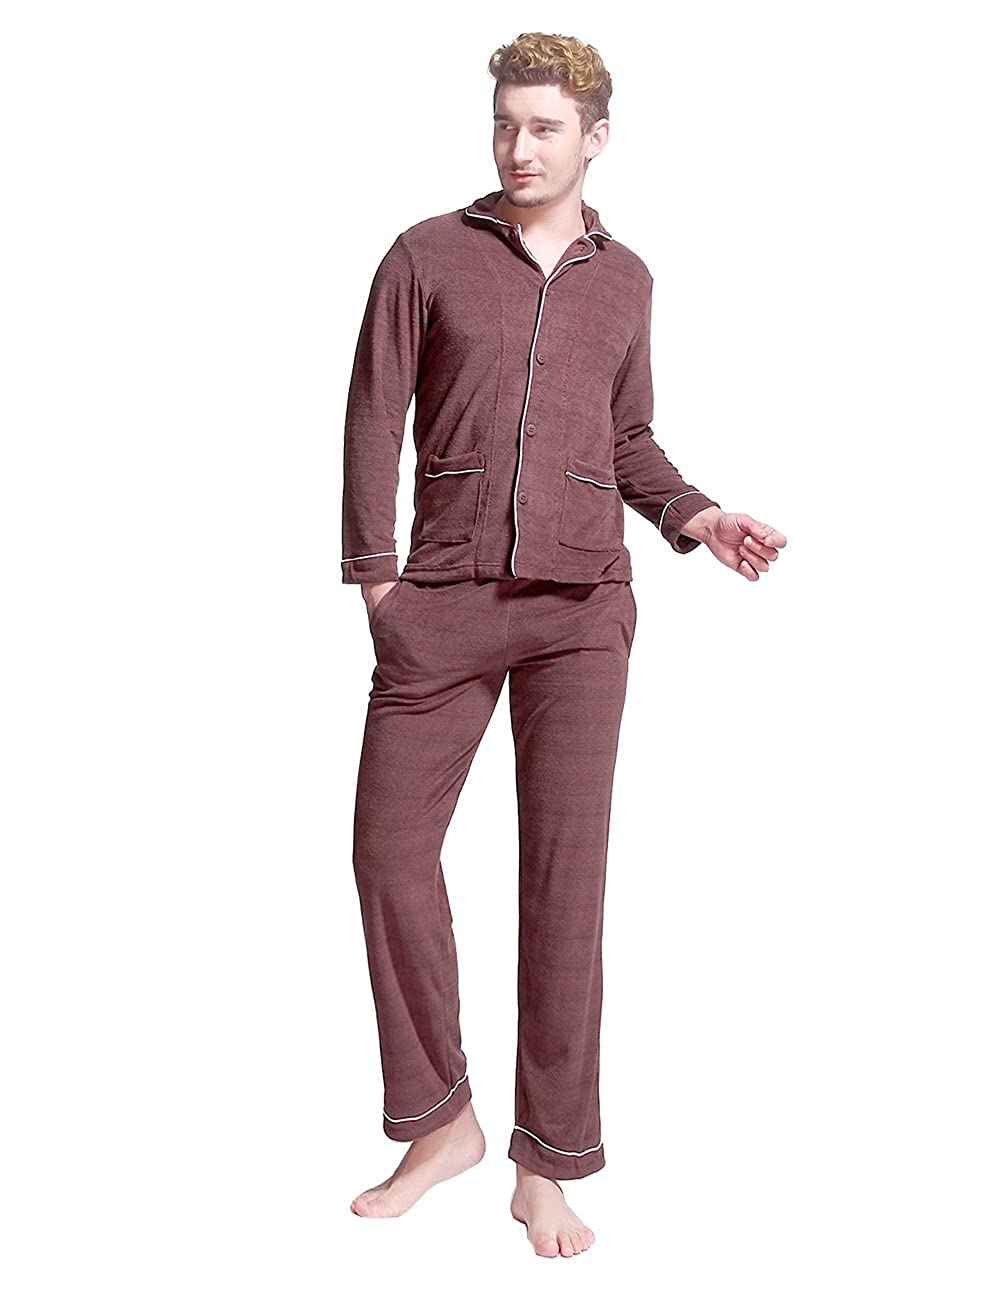 Godsen Men's Button Down Pajama Lounge Sets Tops & Bottoms 8721801